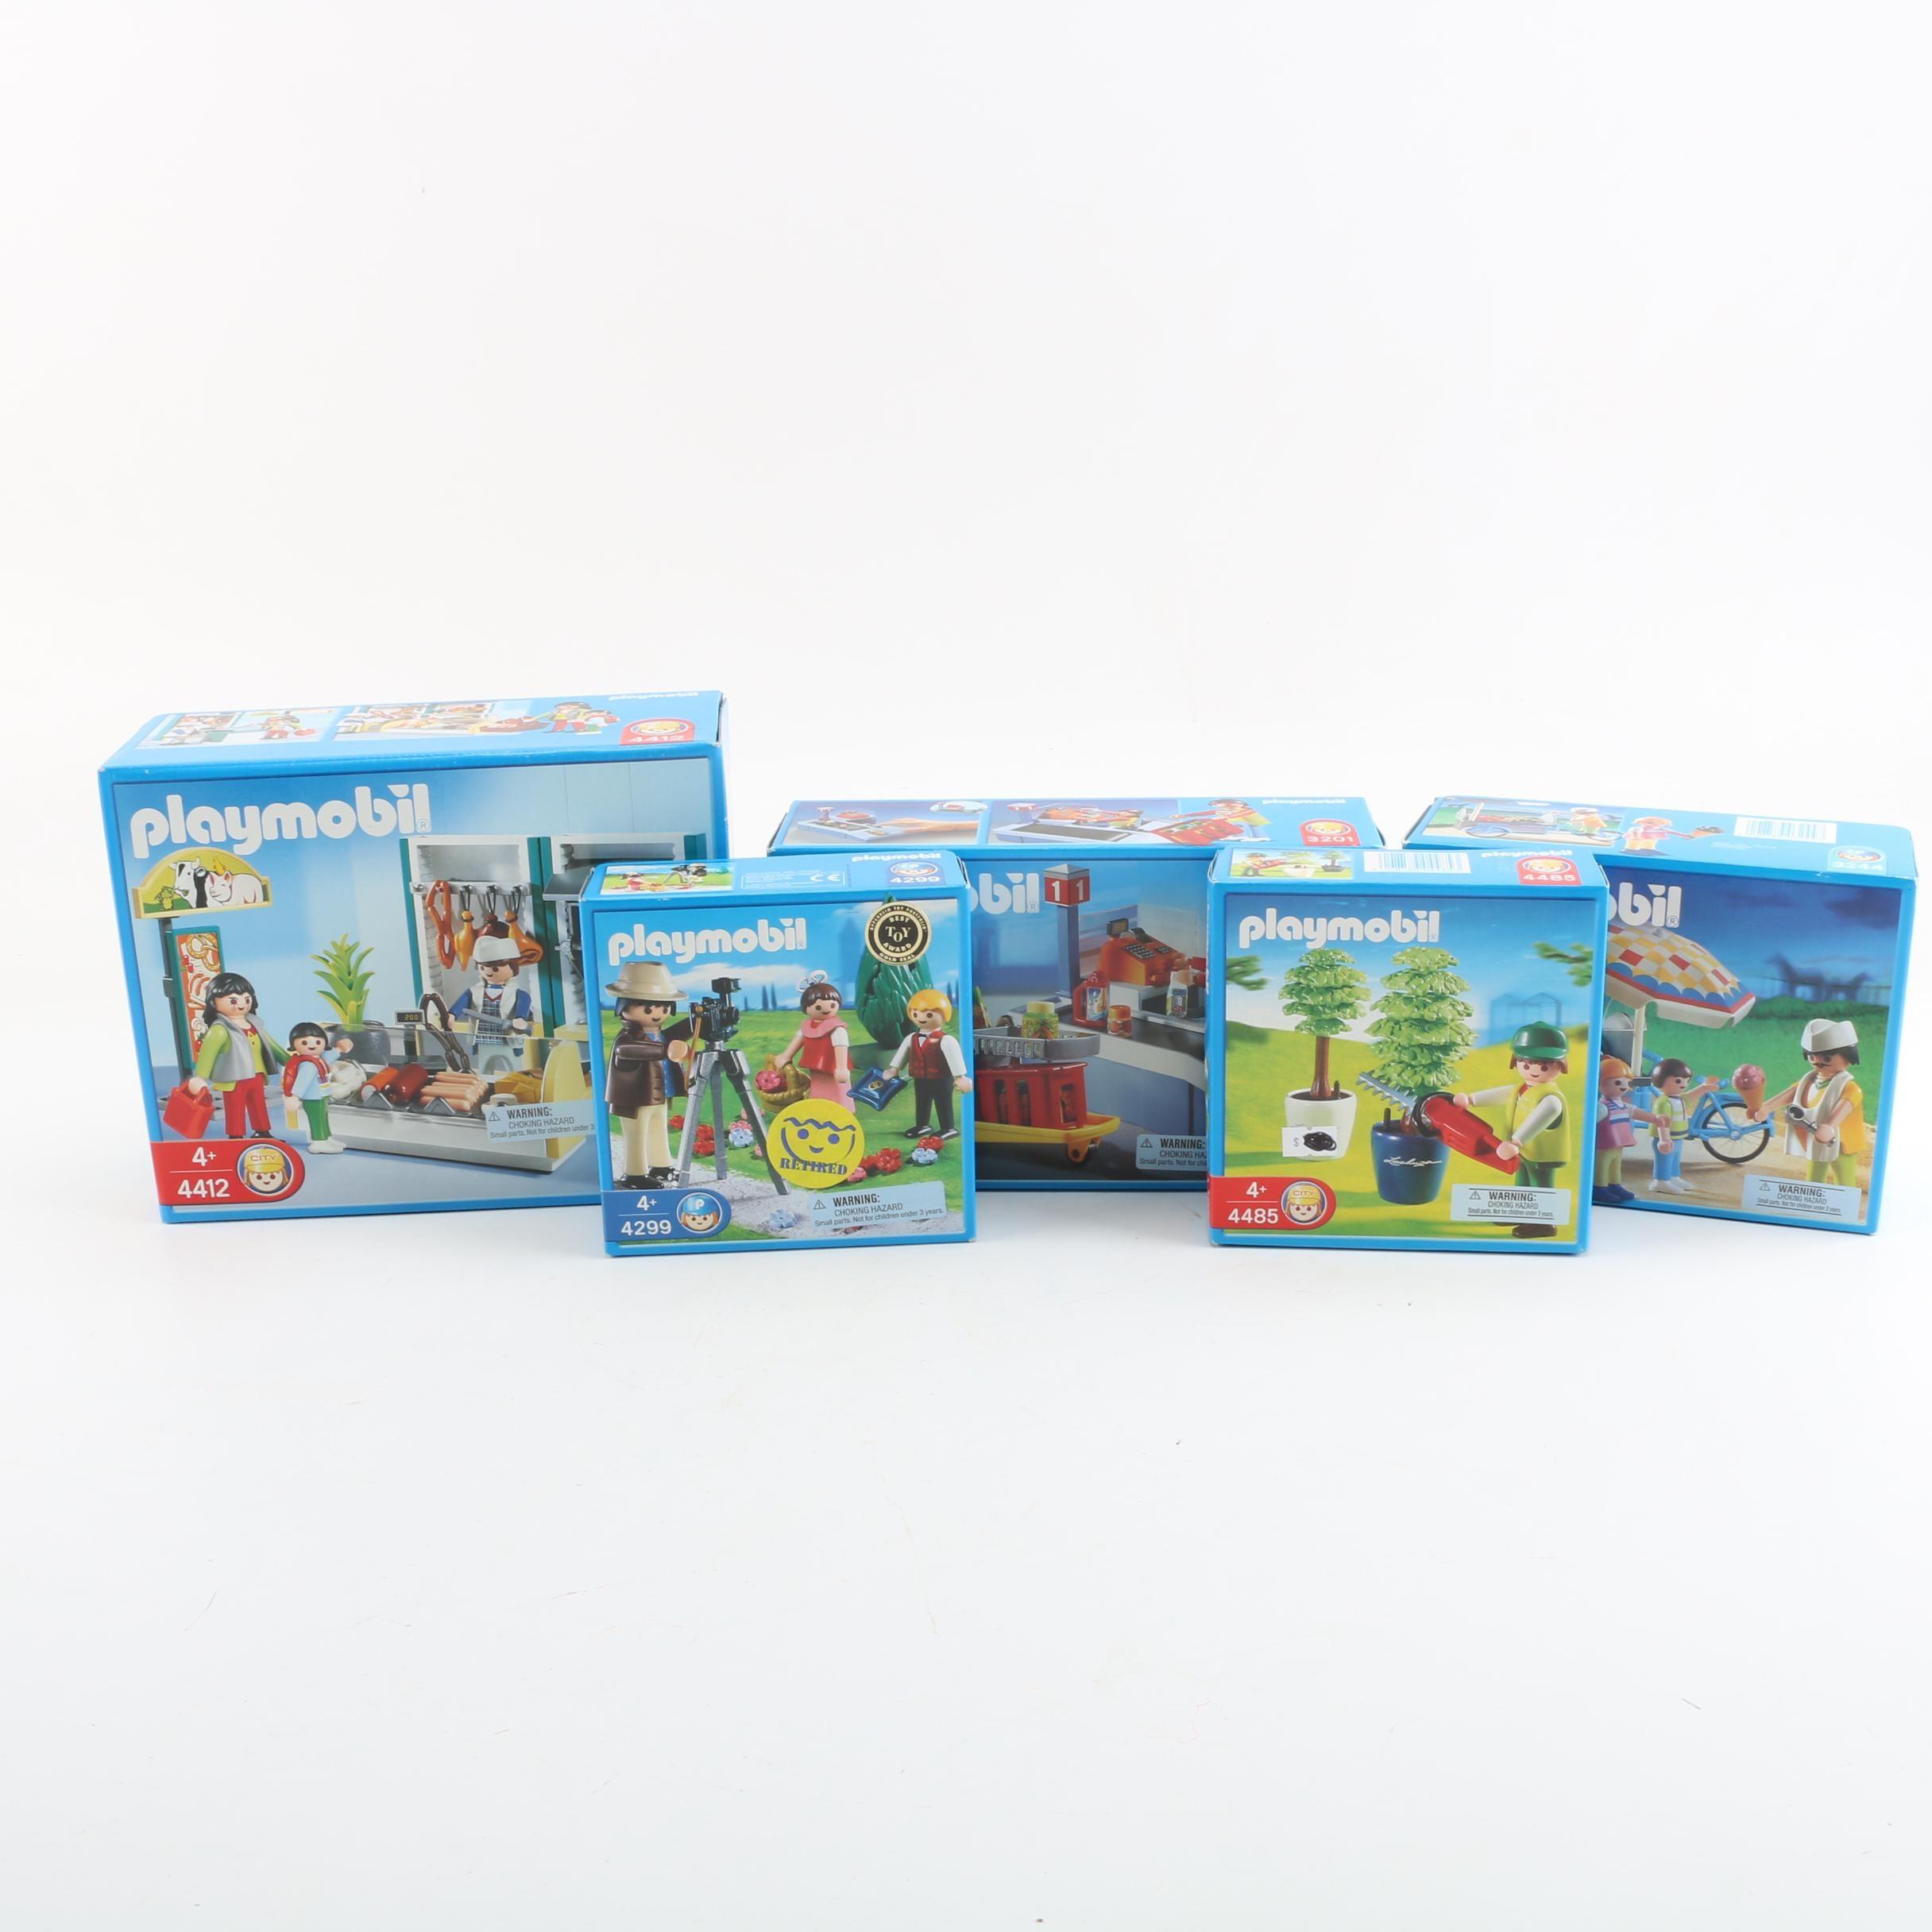 Playmobil Play Sets